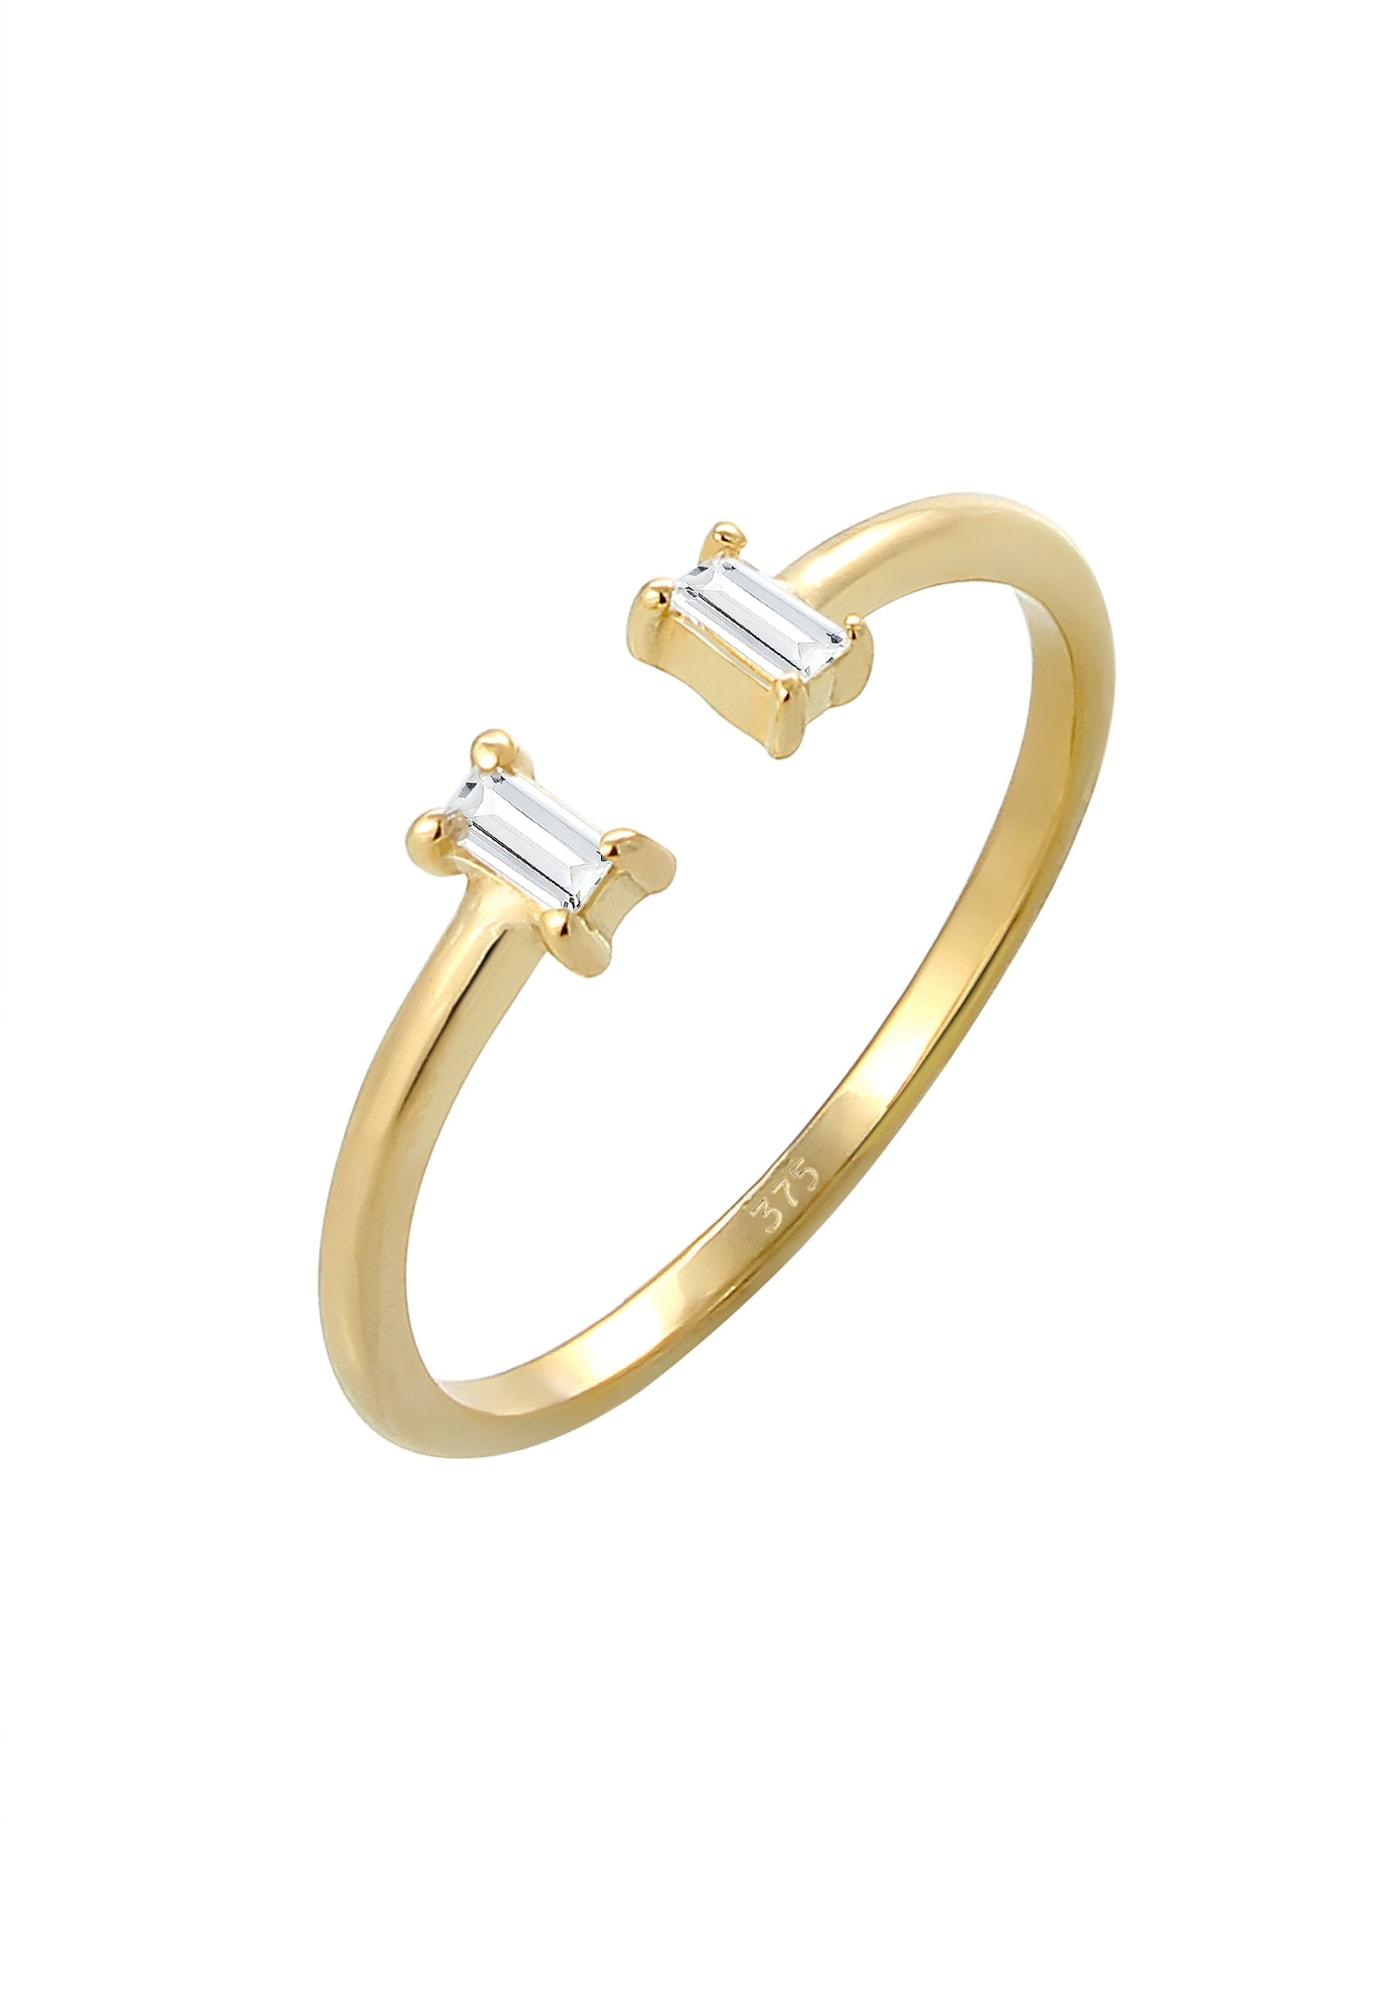 Ring Verlobungsring, open | Schmuck > Ringe > Verlobungsringe | Gold | ELLI PREMIUM